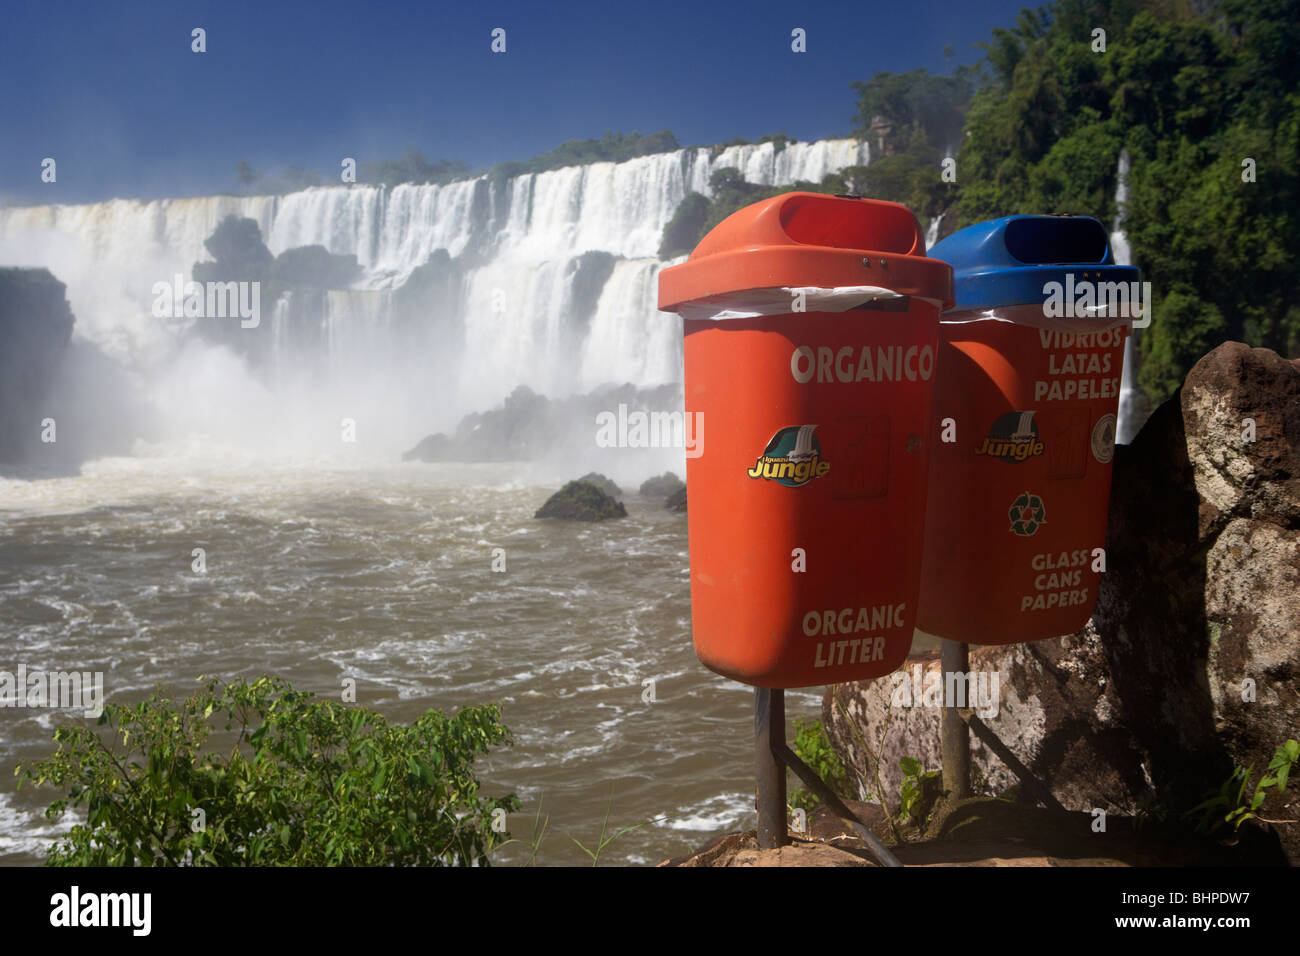 recycling bins at iguazu national park, republic of argentina, south america Stock Photo